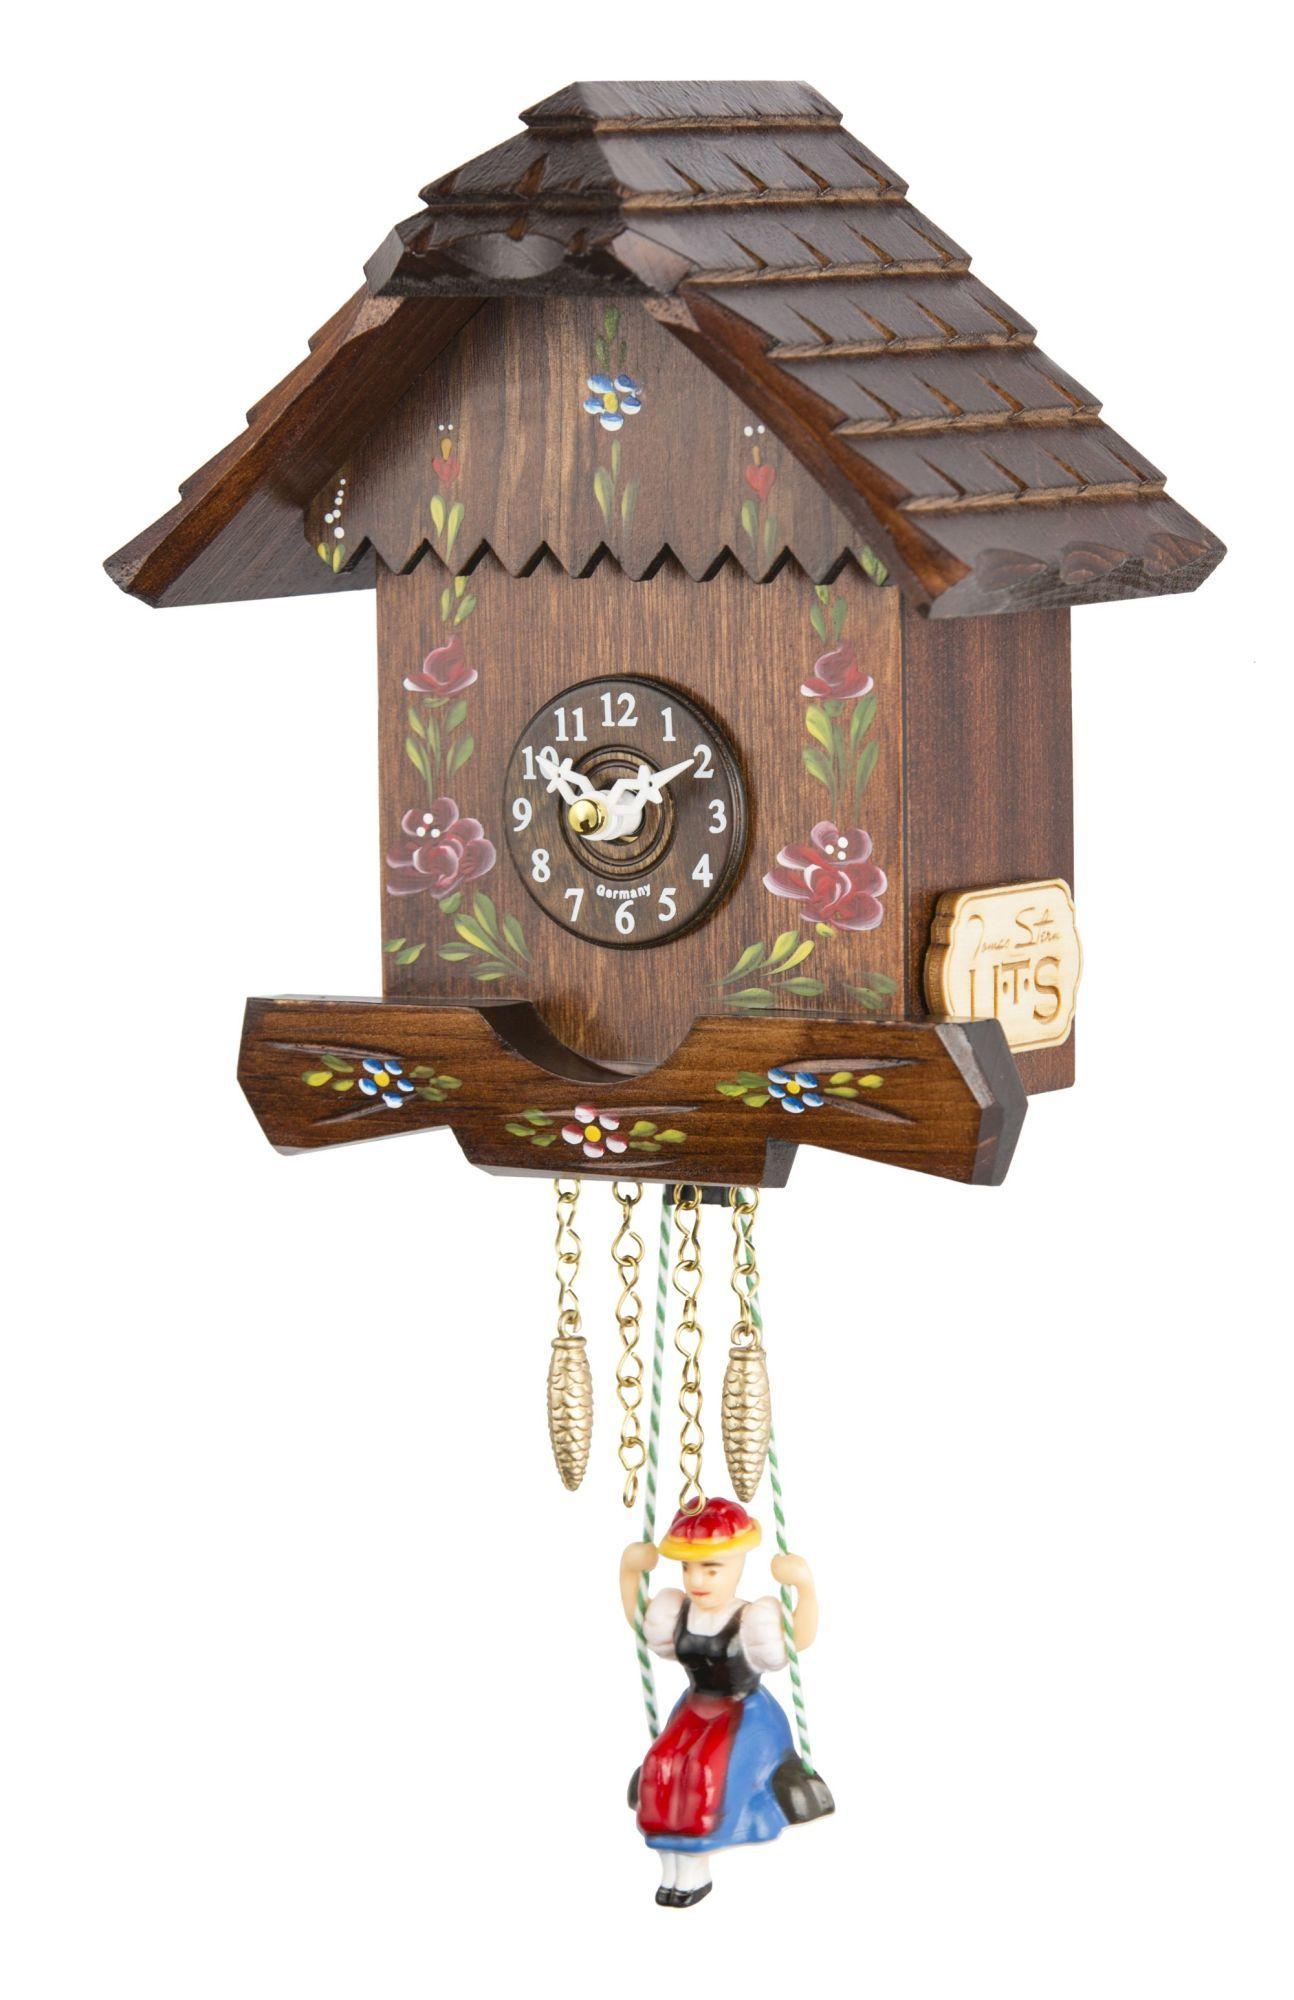 Часы настенные Часы настенные с кукушкой Tomas Stern 5030 chasy-nastennye-s-kukushkoy-tomas-stern-5030-germaniya.jpg